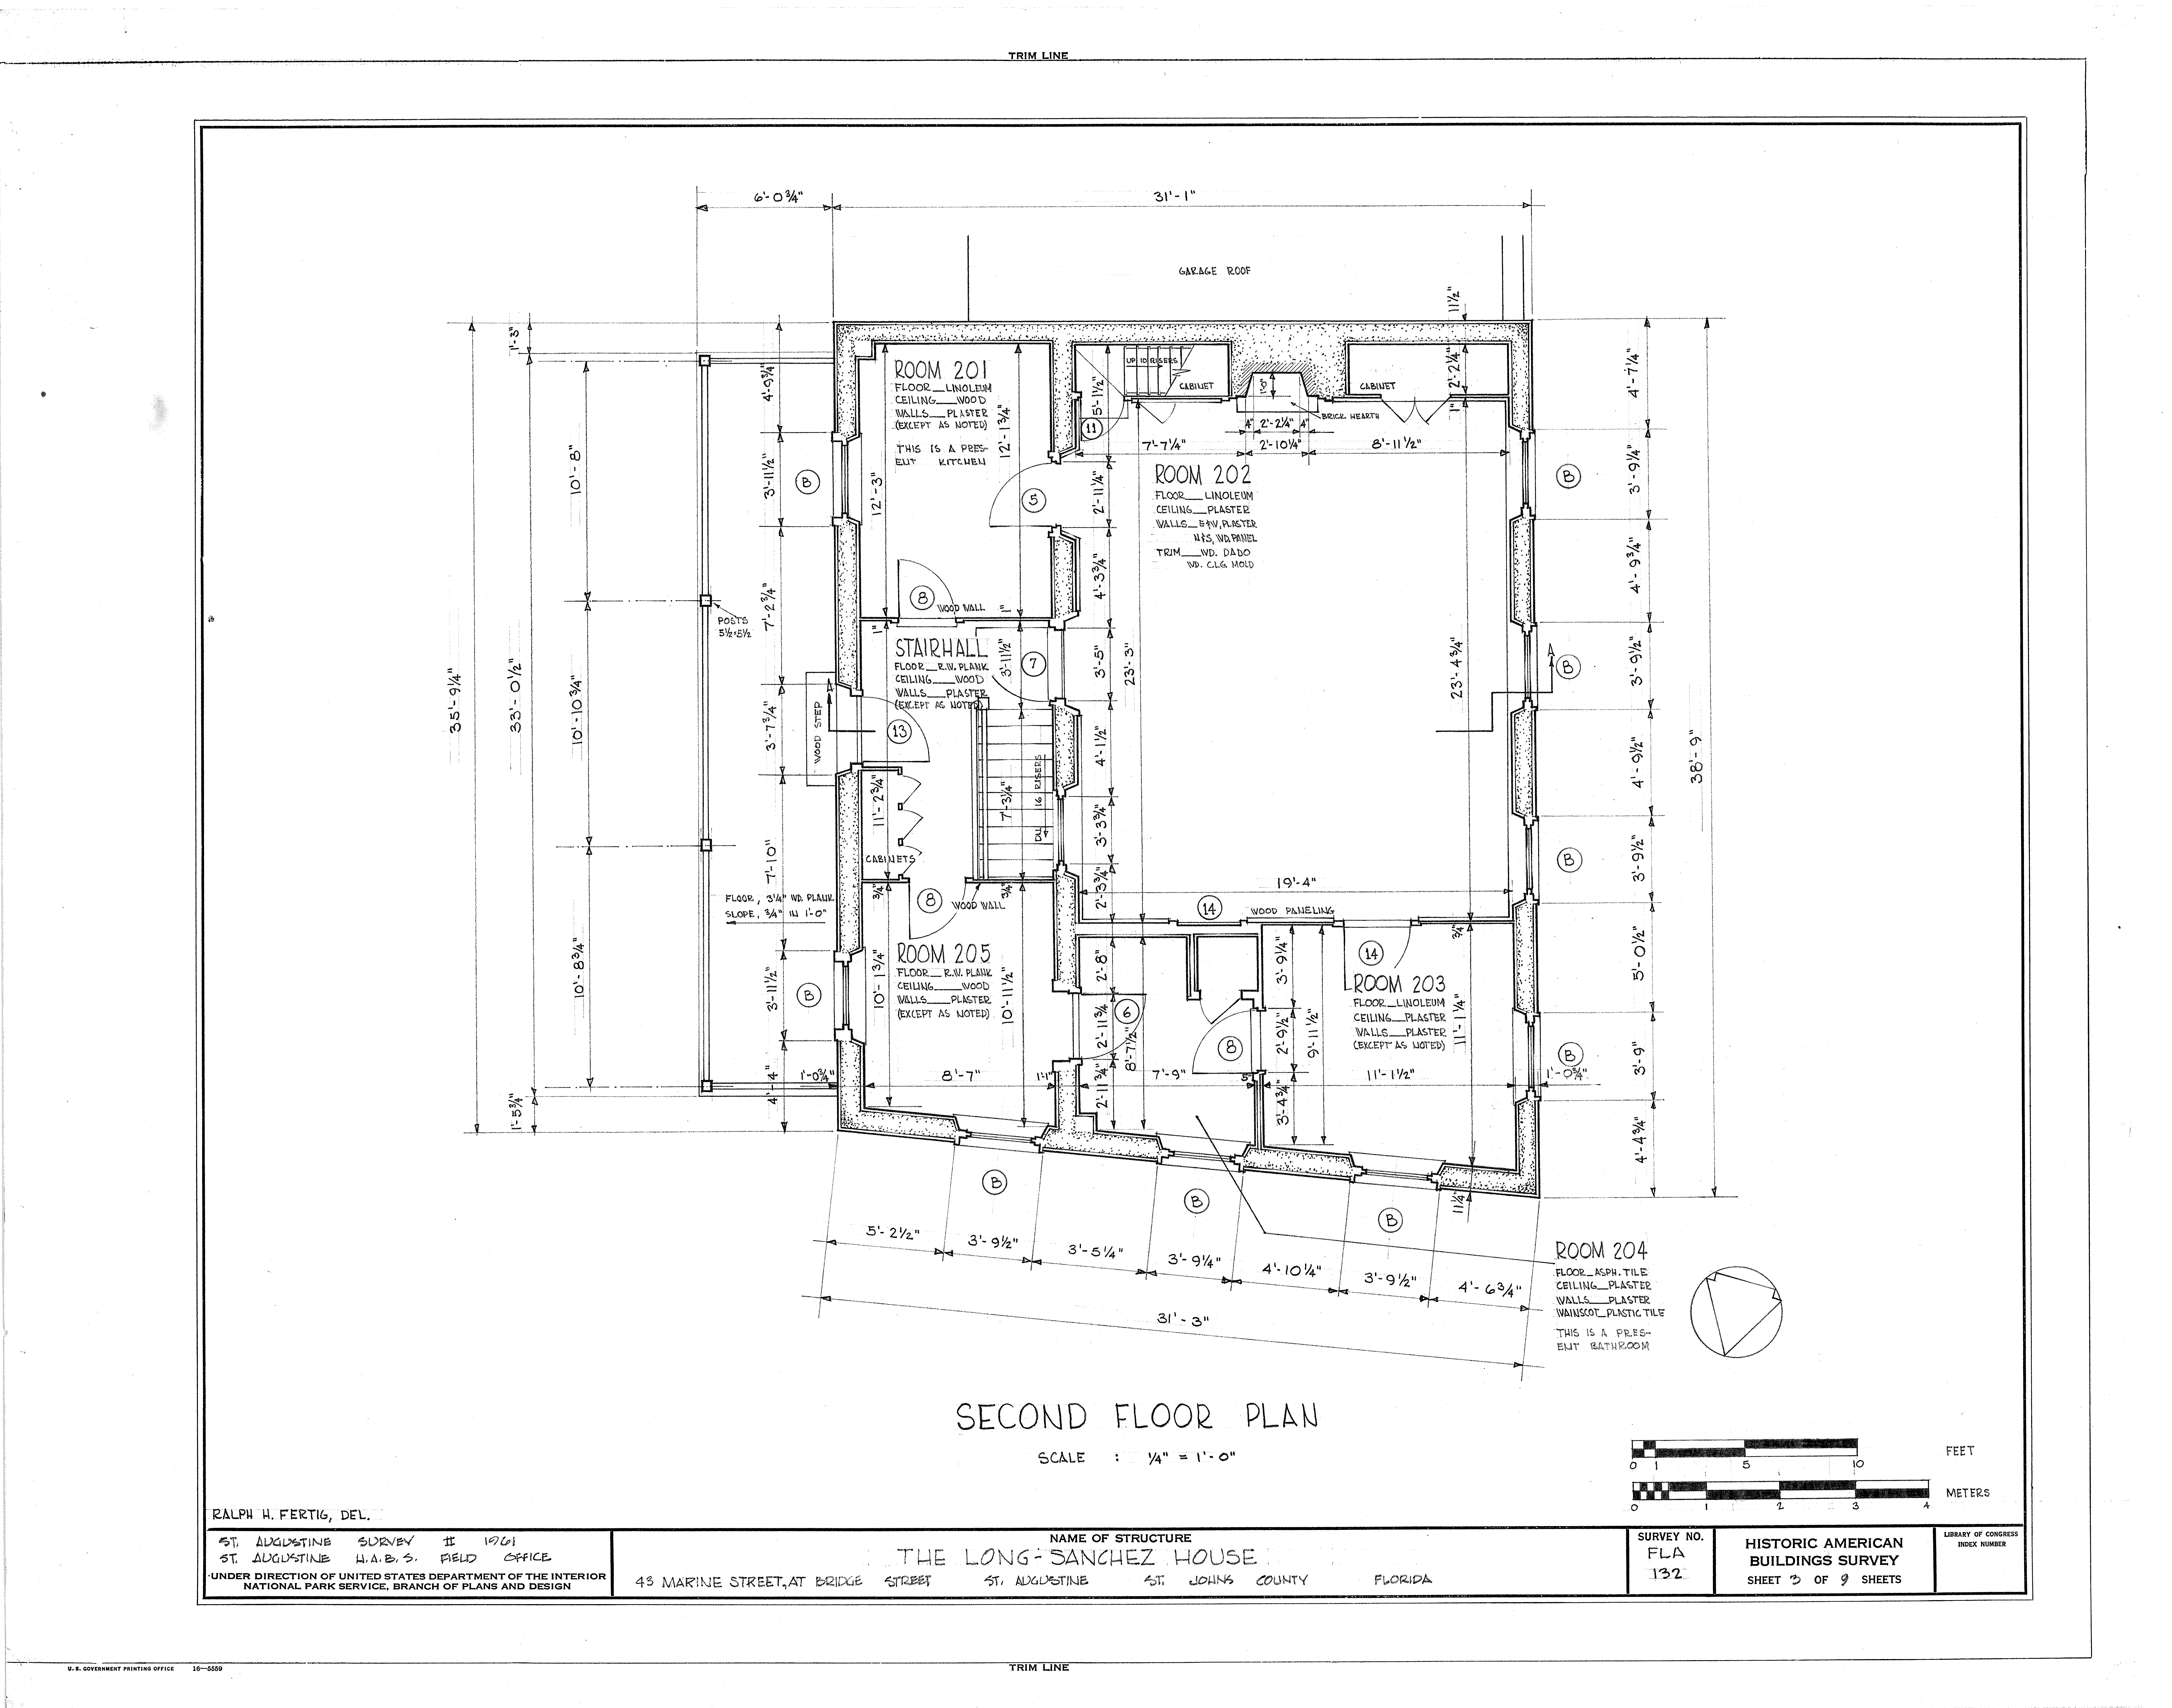 file second floor plan long sanchez house 43 marine street